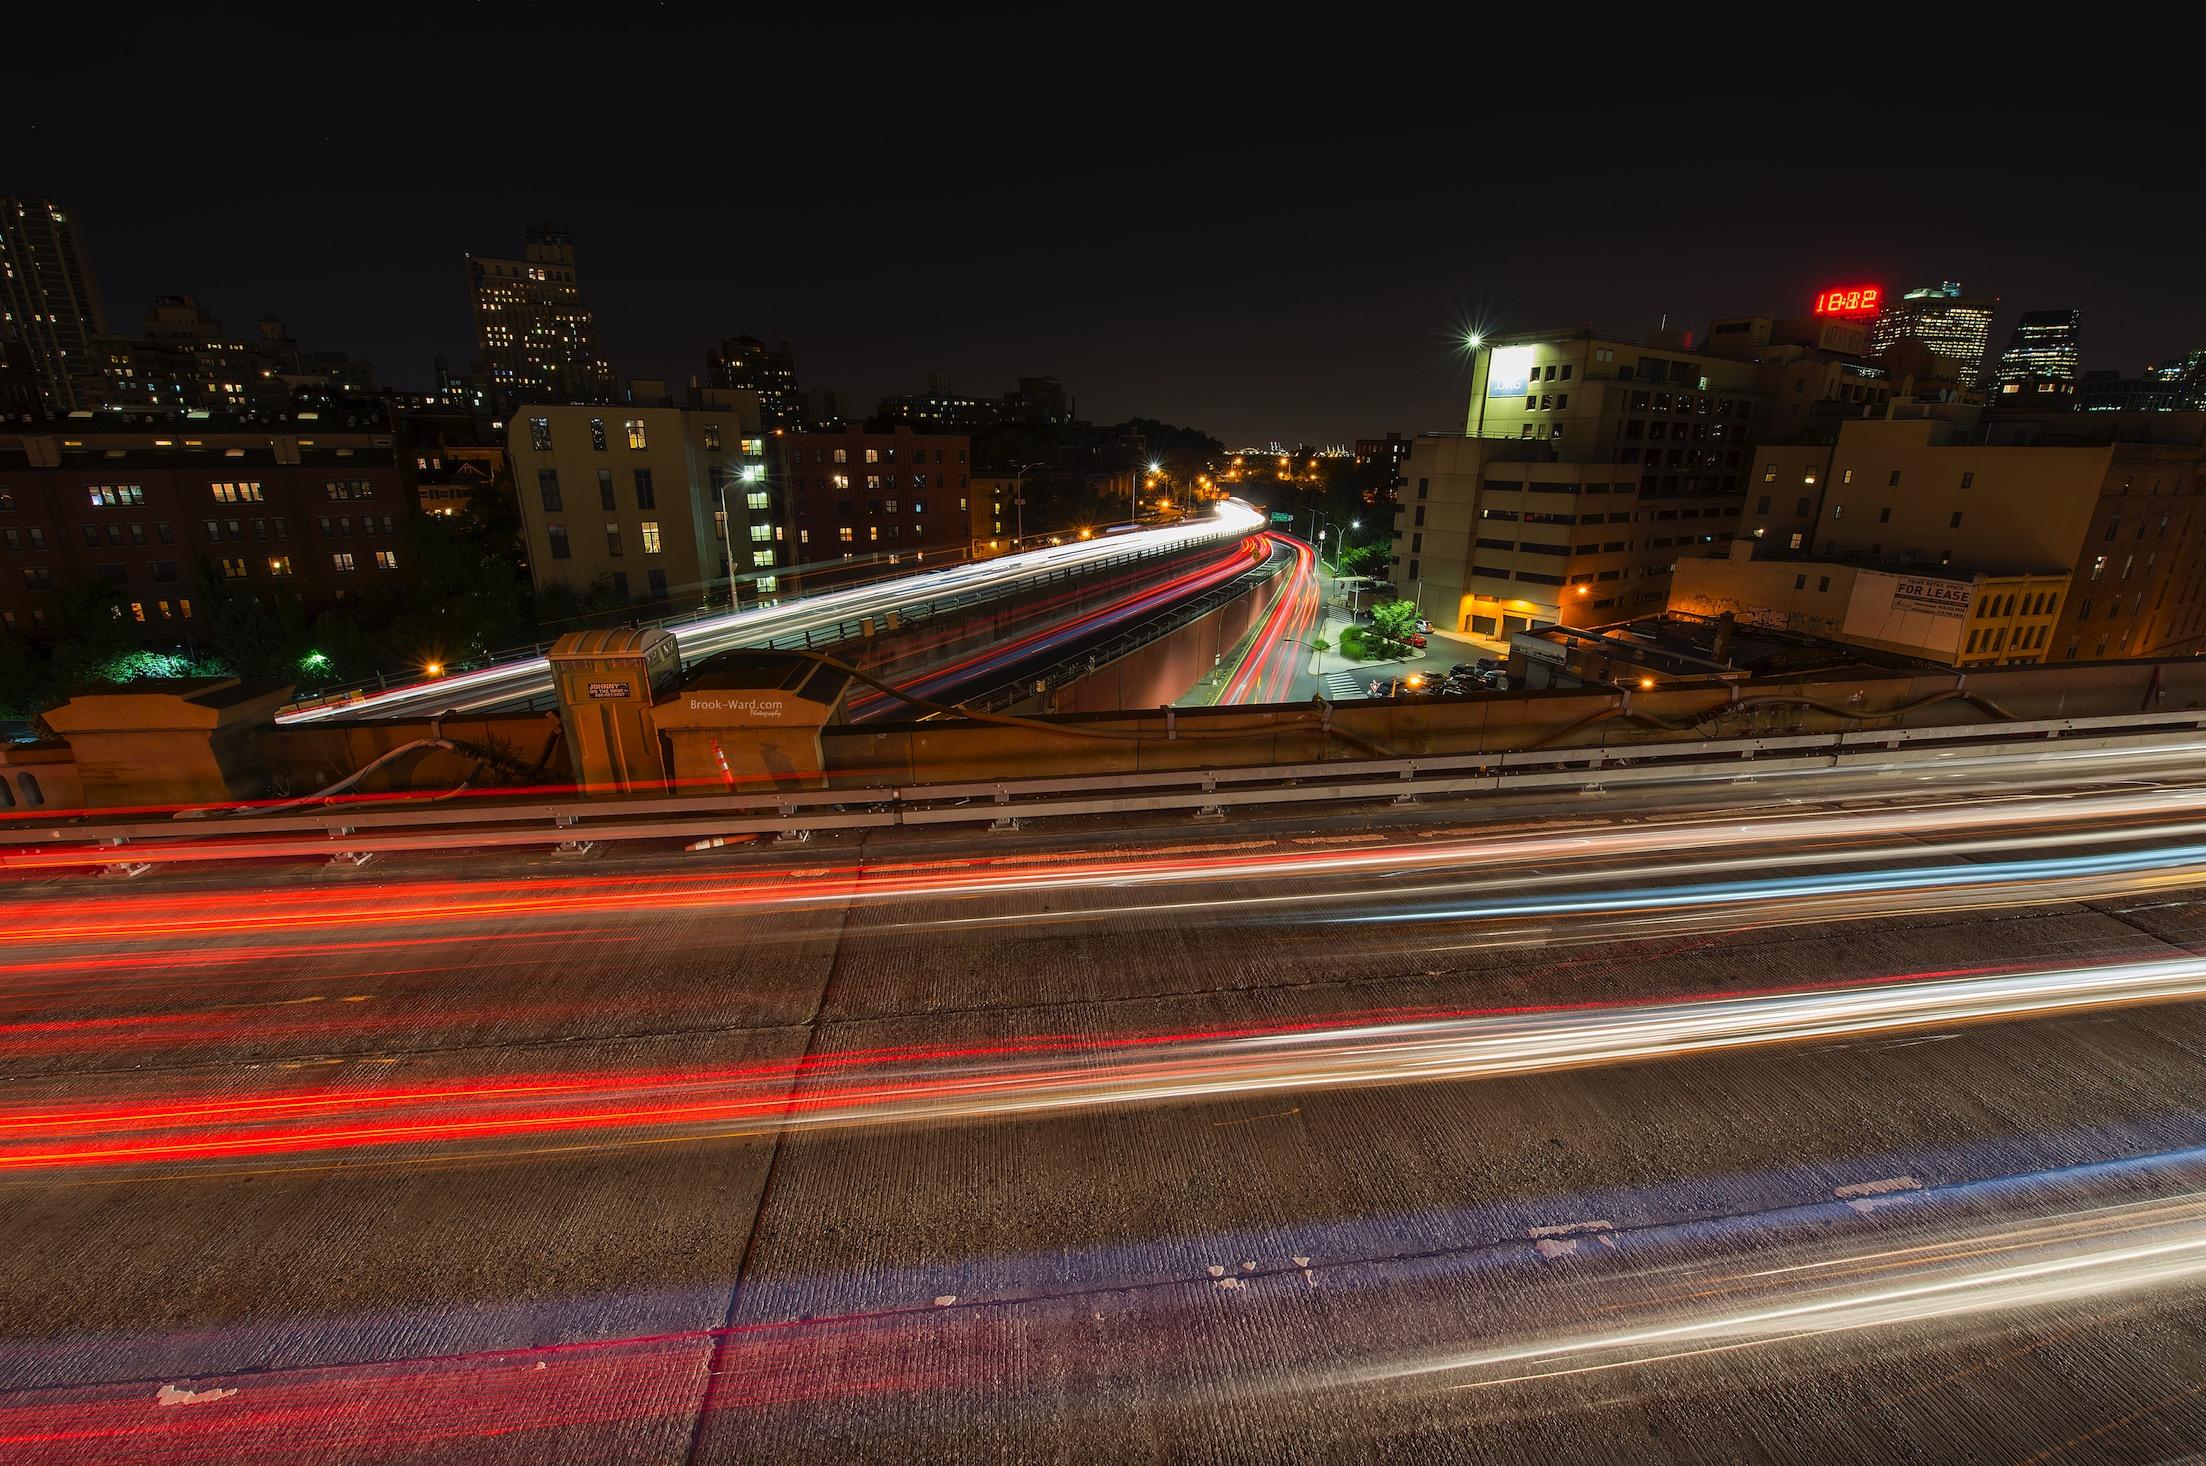 Traffic light trails in Brooklyn